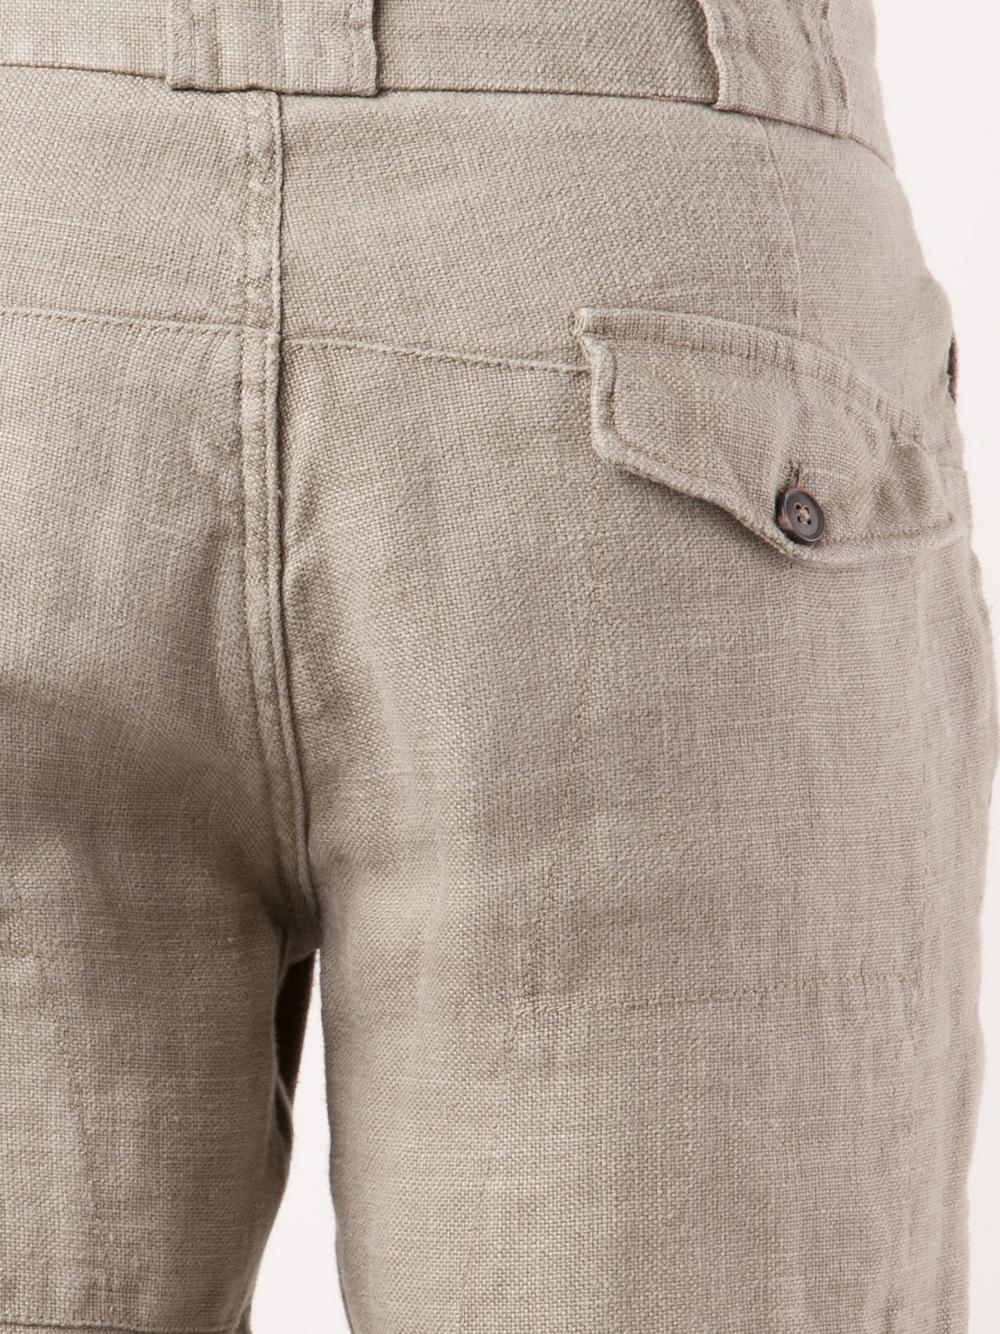 Michael Bastian Hiking Trousers in Green for Men